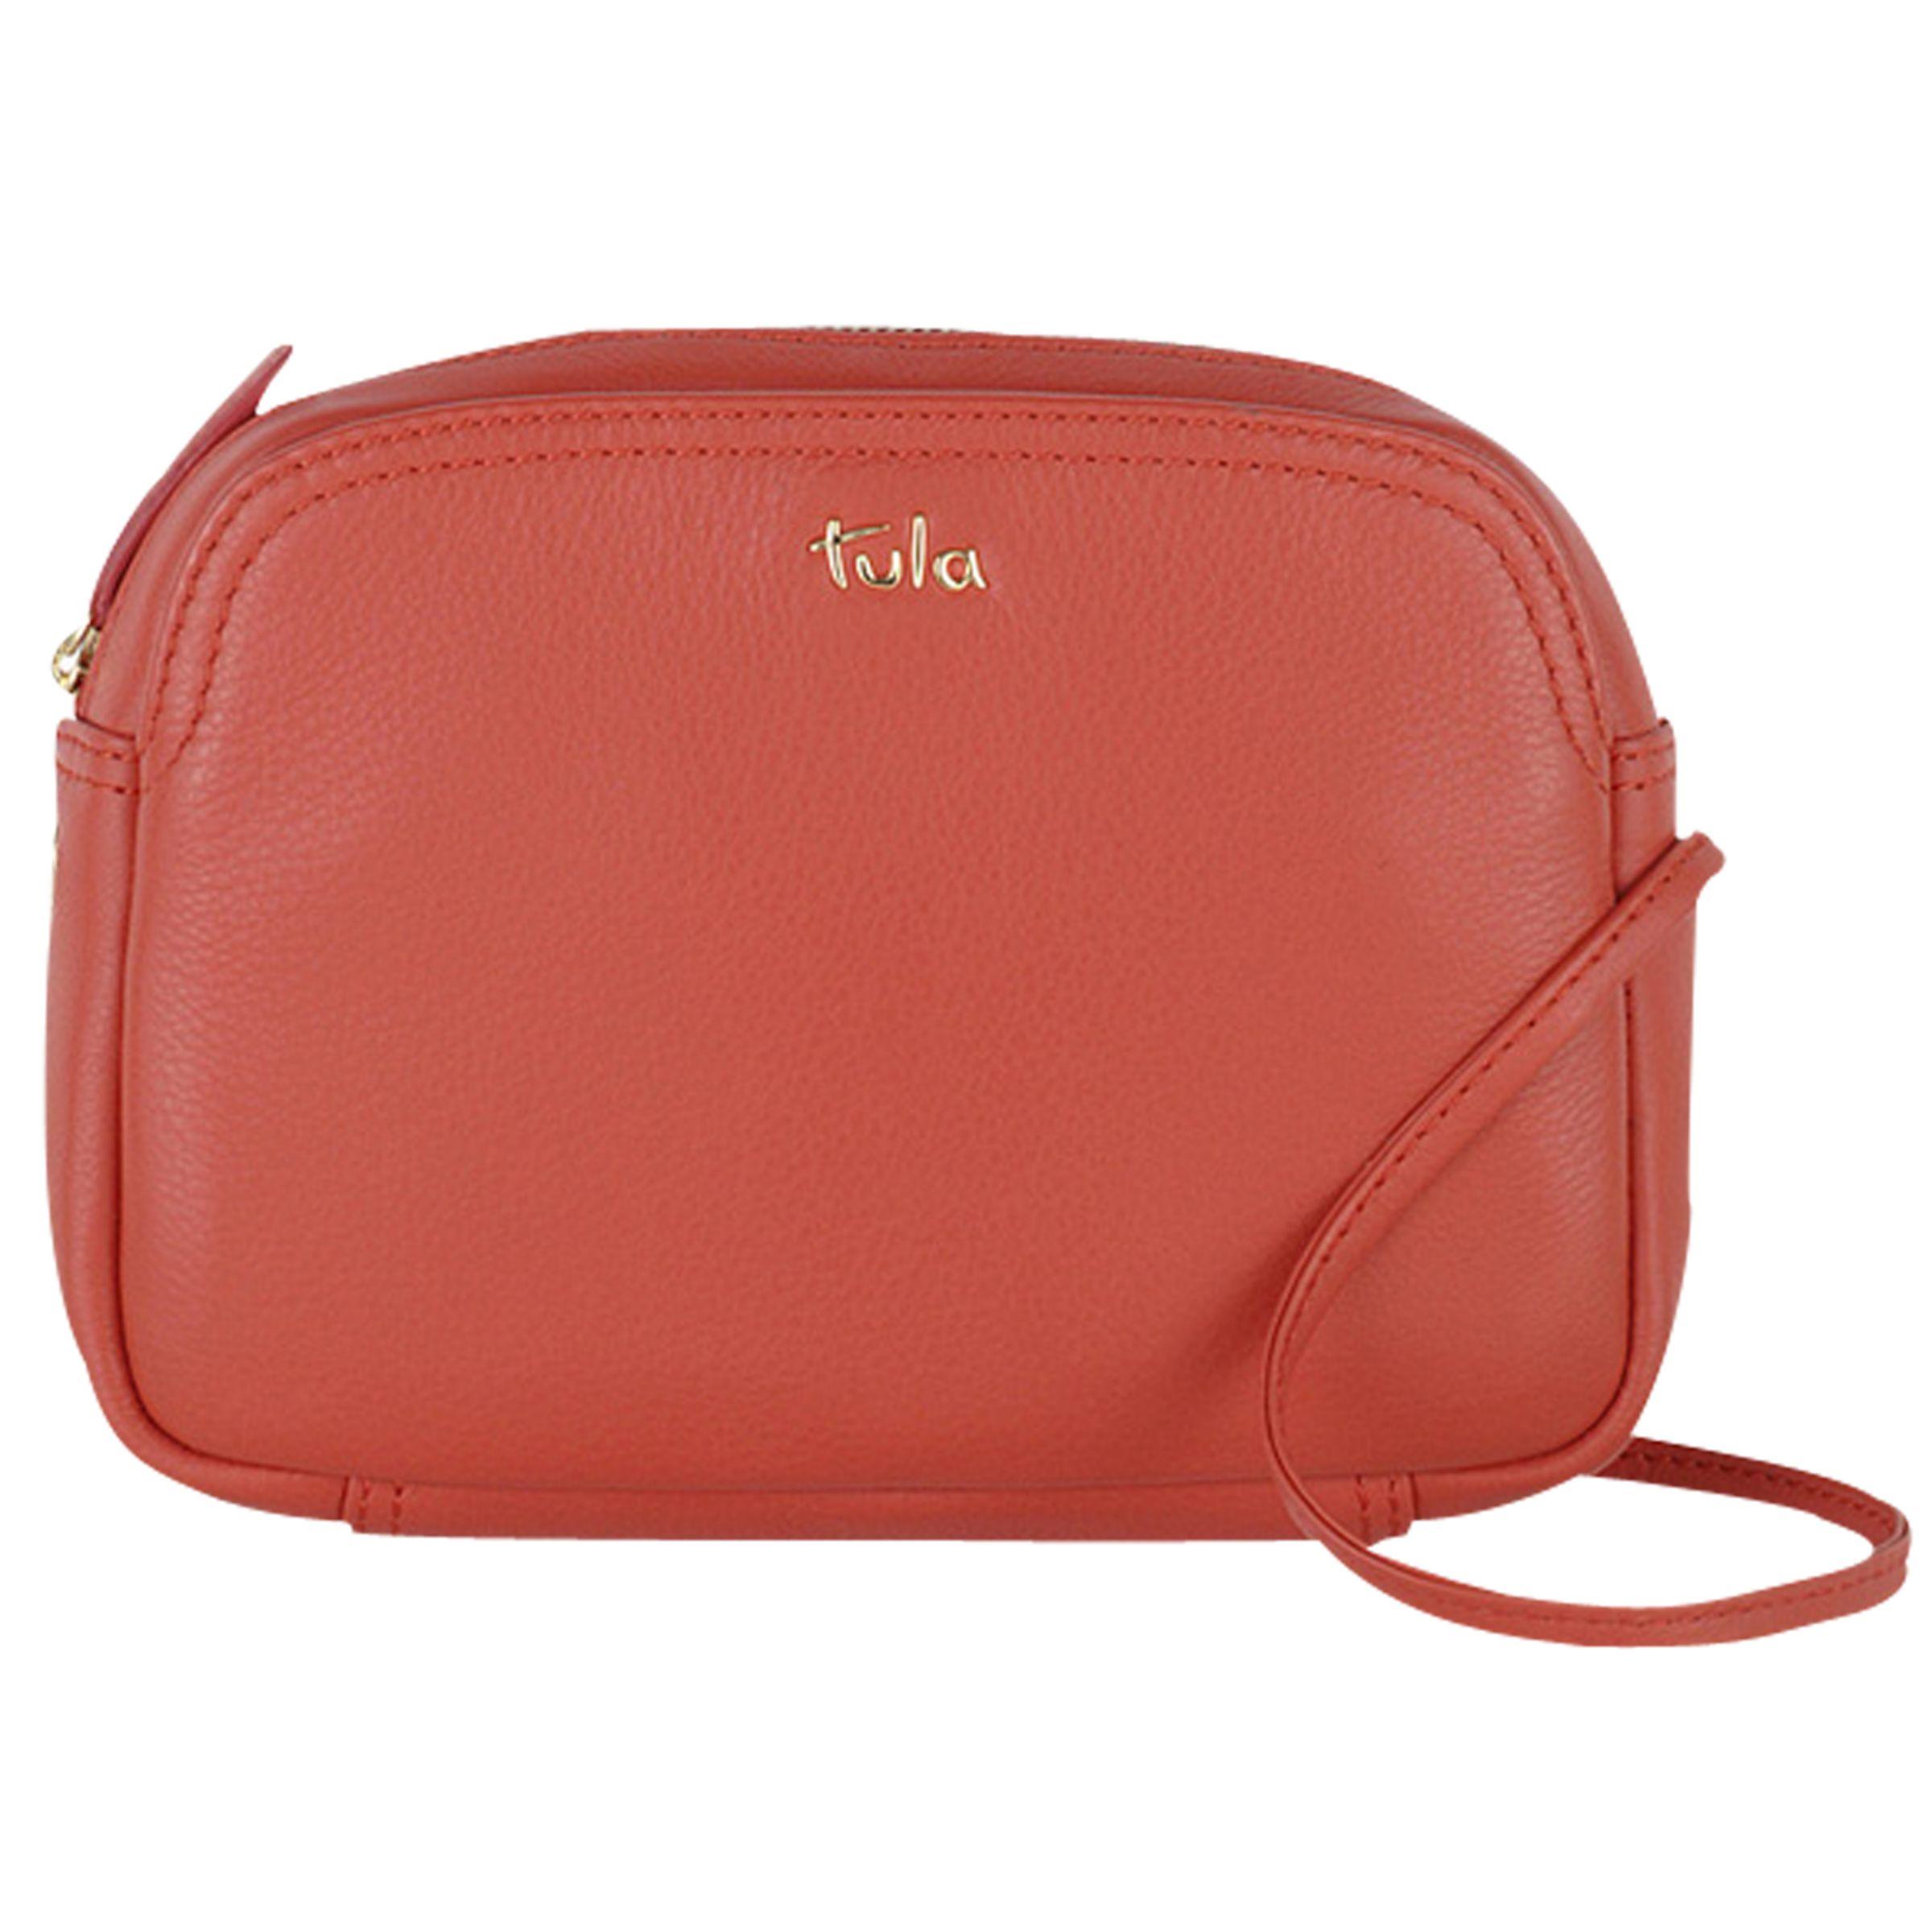 Tula Tula Nappa Originals Leather Small Across Body Bag